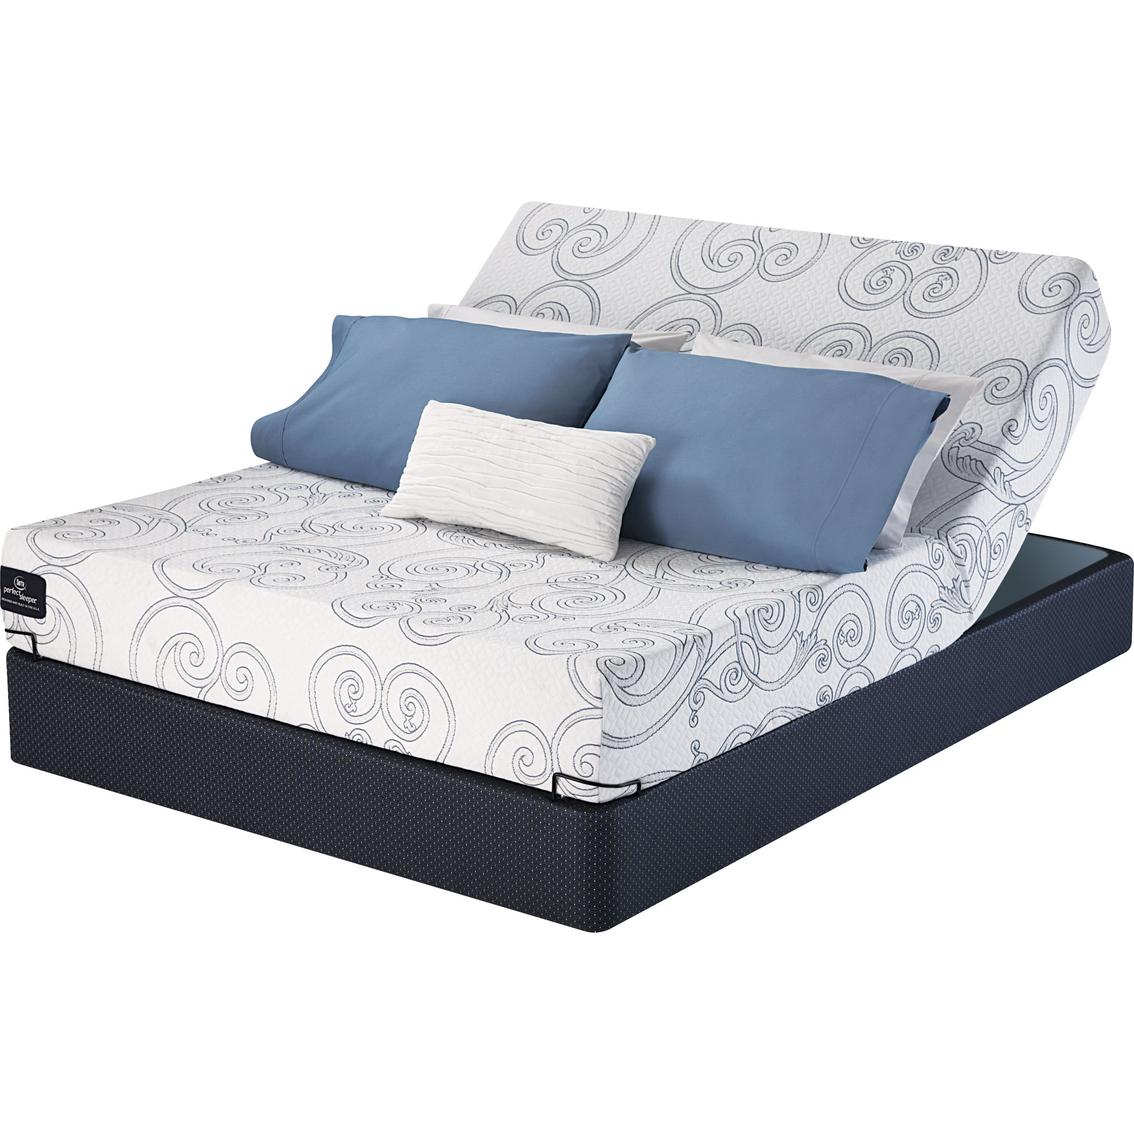 serta office chair 10 year warranty bed uk perfect sleeper leadership memory foam firm mattress